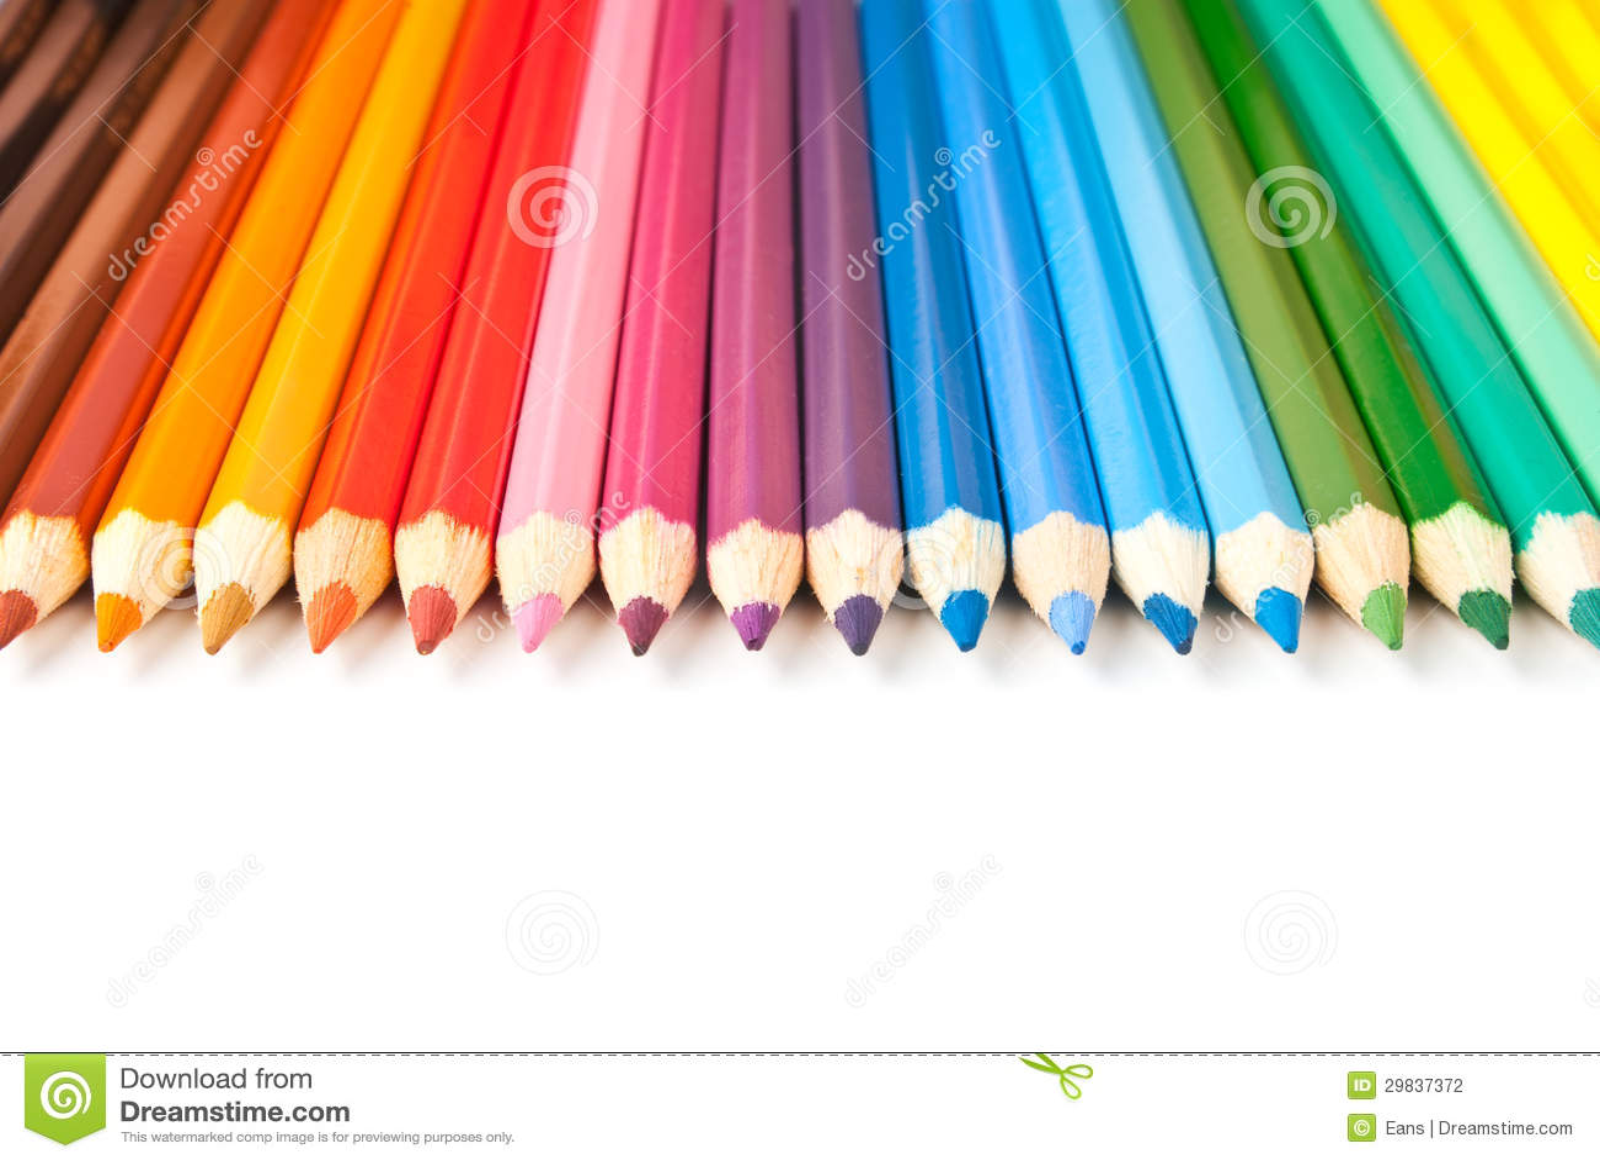 Lápis da cor na fileira